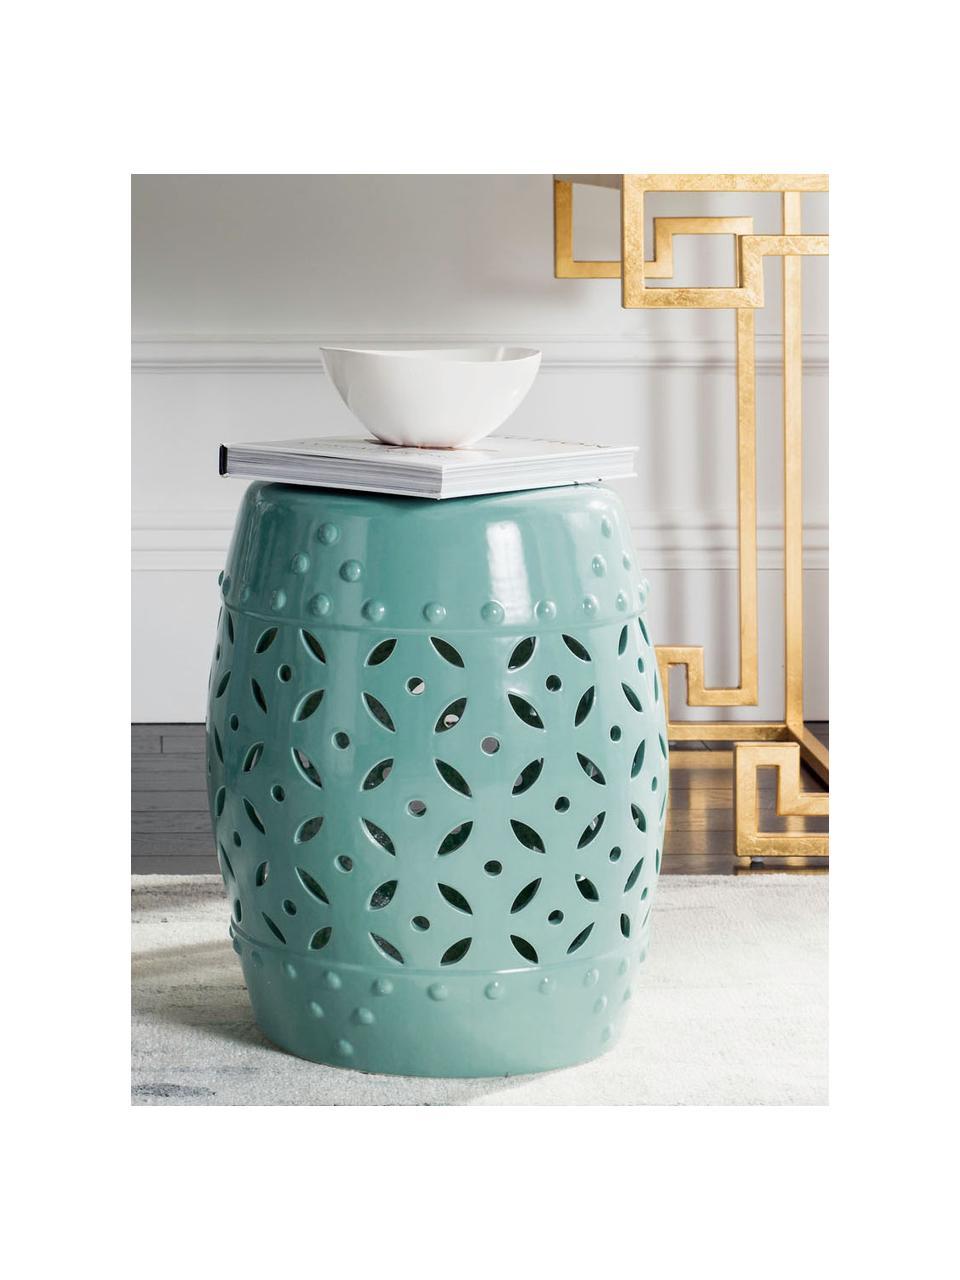 Outdoor kruk / bijzettafel Philine, Geglazuurd keramiek, Turquoise, Ø 33 x H 47 cm